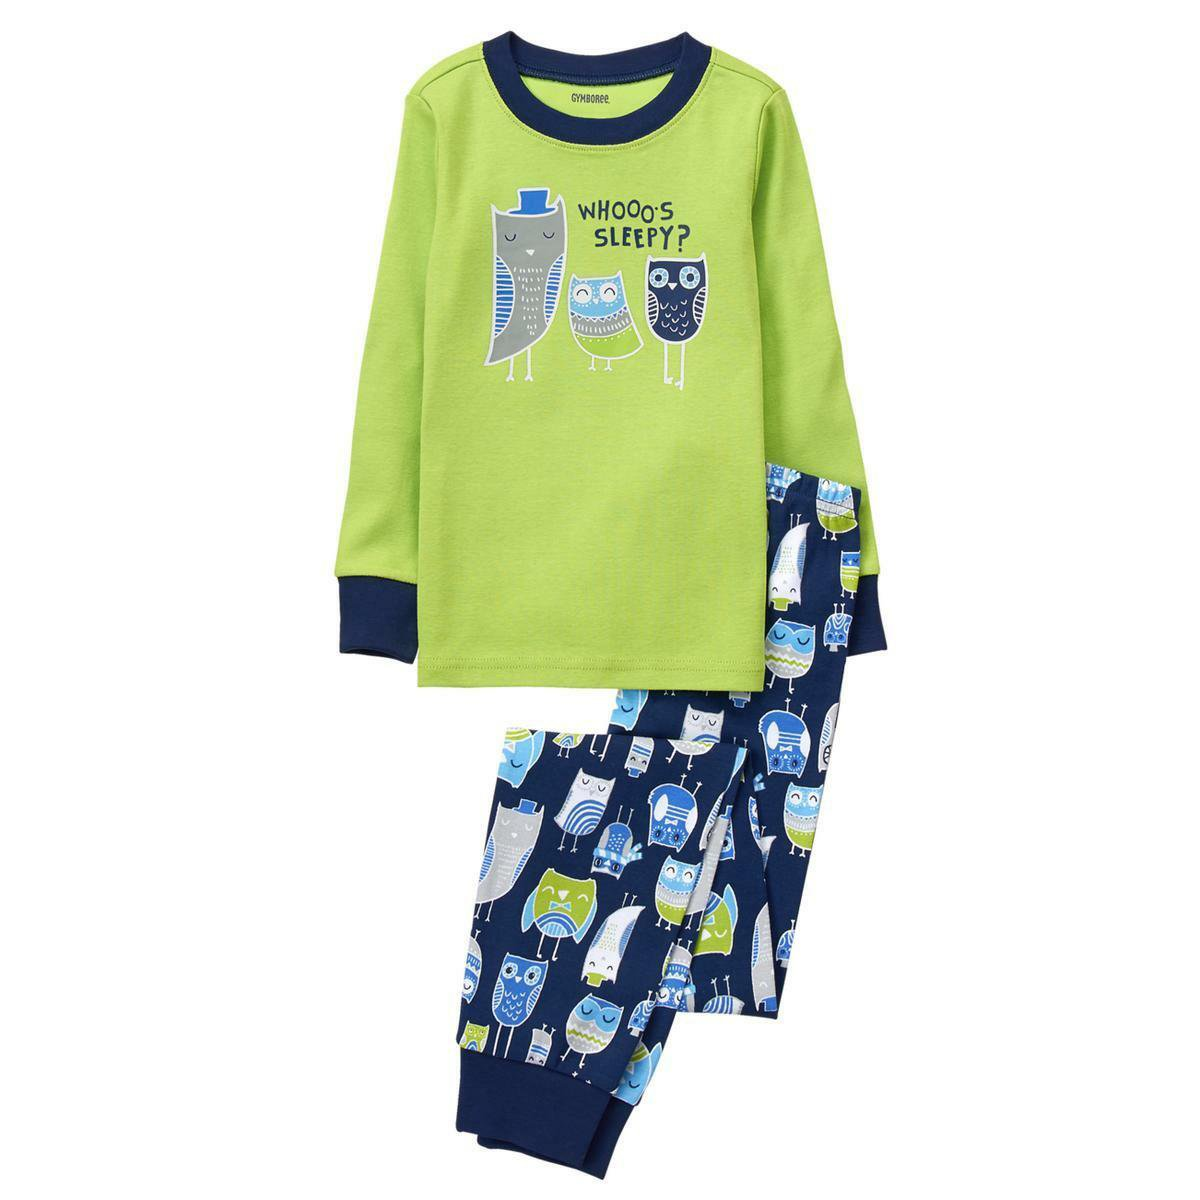 NWT Gymboree Boys Owl Long Sleeve Gymmies Pajamas 12-18 Months